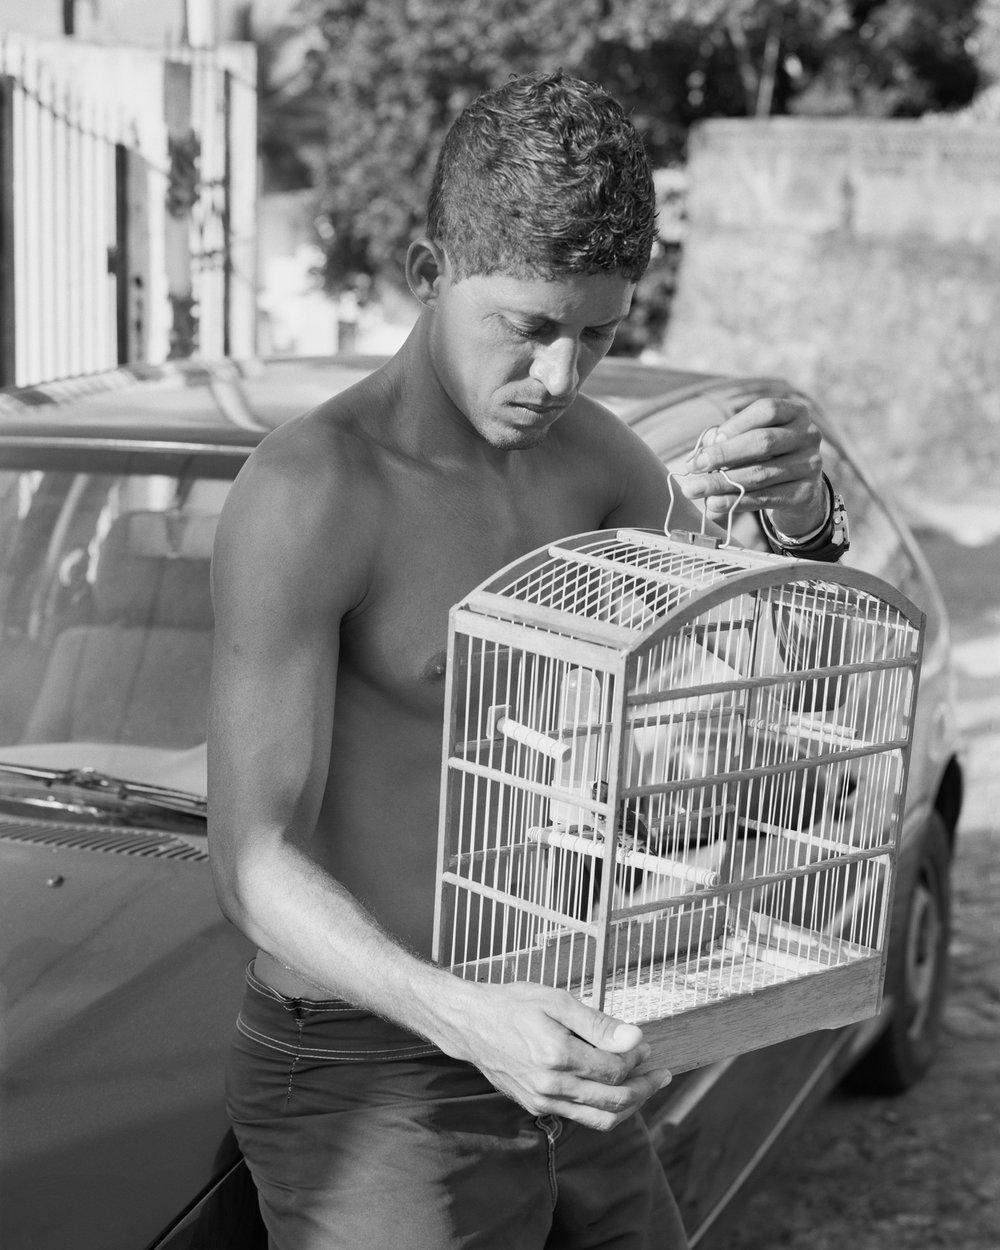 Fábio Santos resting on car with birdcage, March, 2014, Itaparica, Brazil. 2014/2018